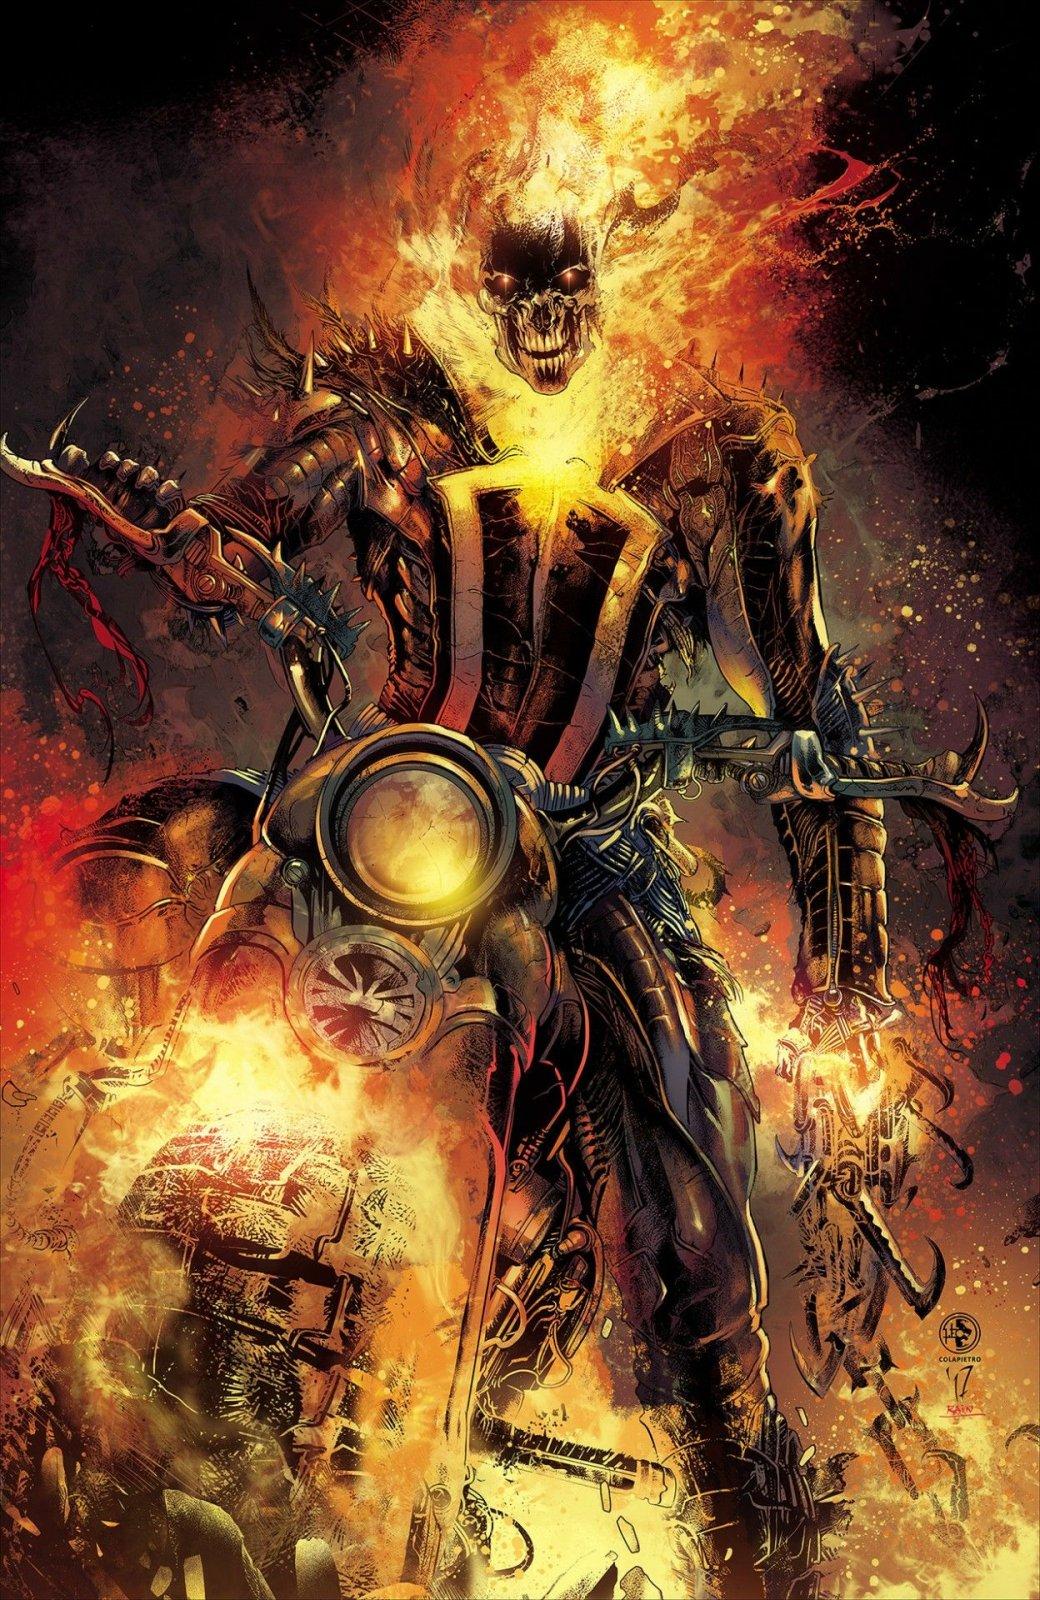 Johnny_Ghost_Rider_Earth-61615.jpg